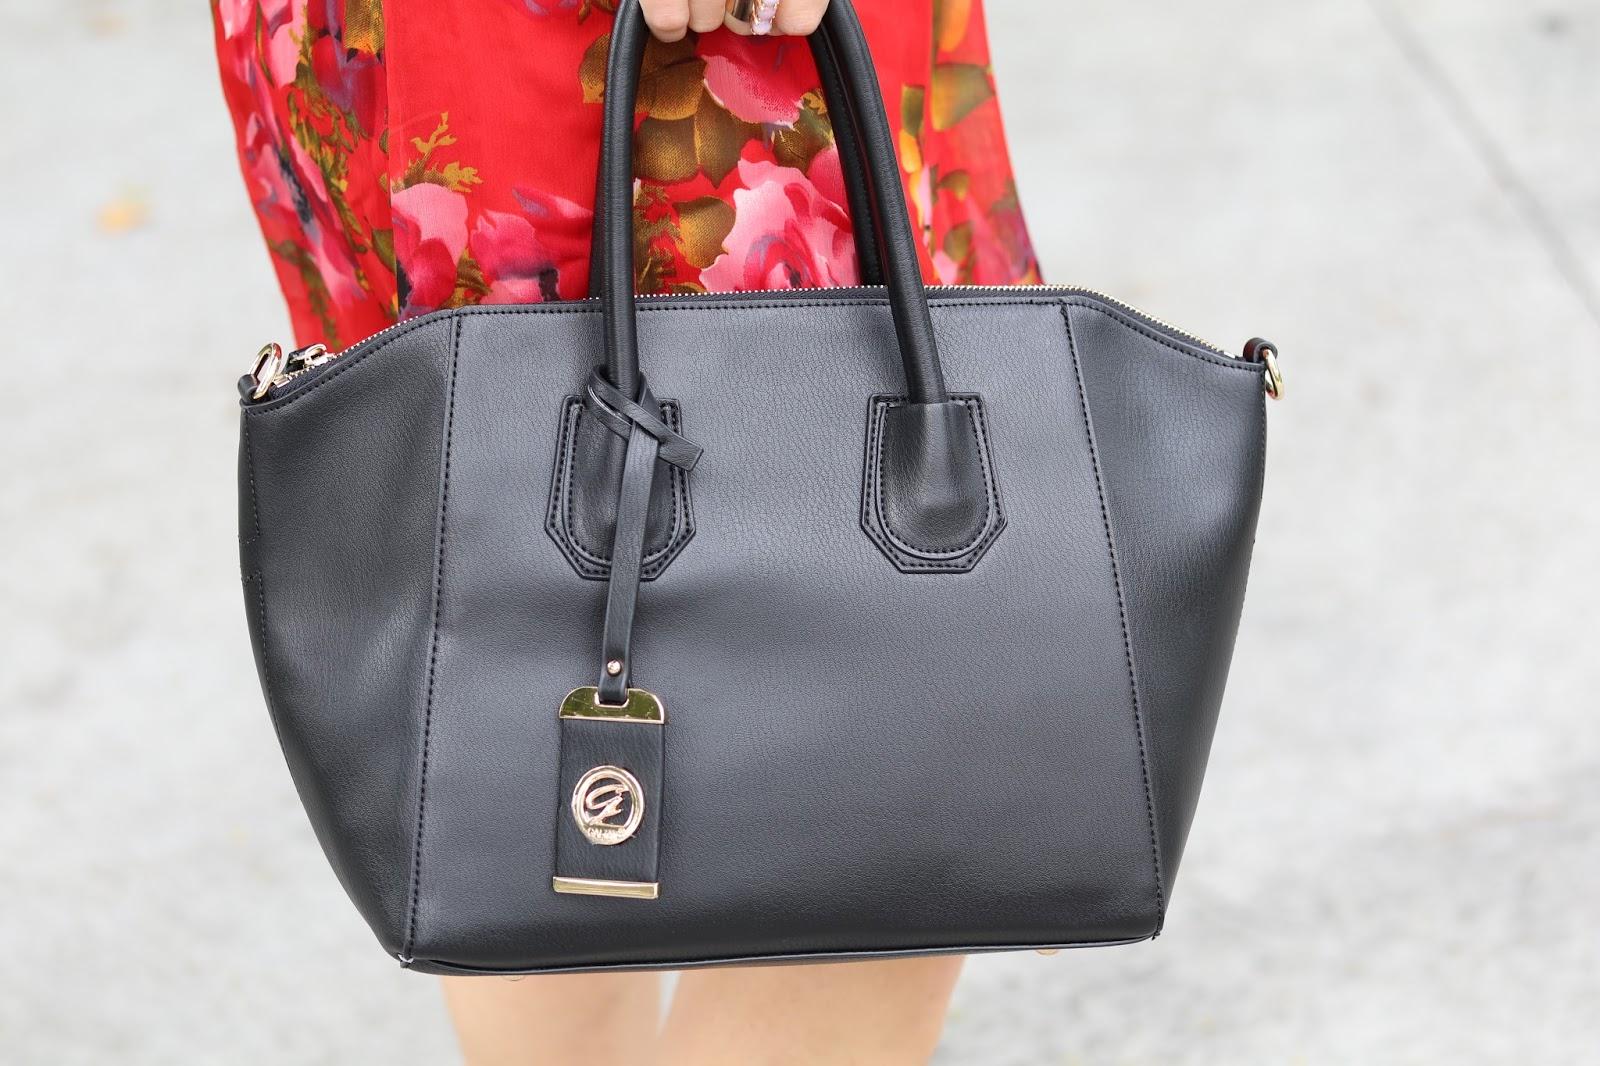 Galian Georgie Top Handle Handbag, affordable black handbags